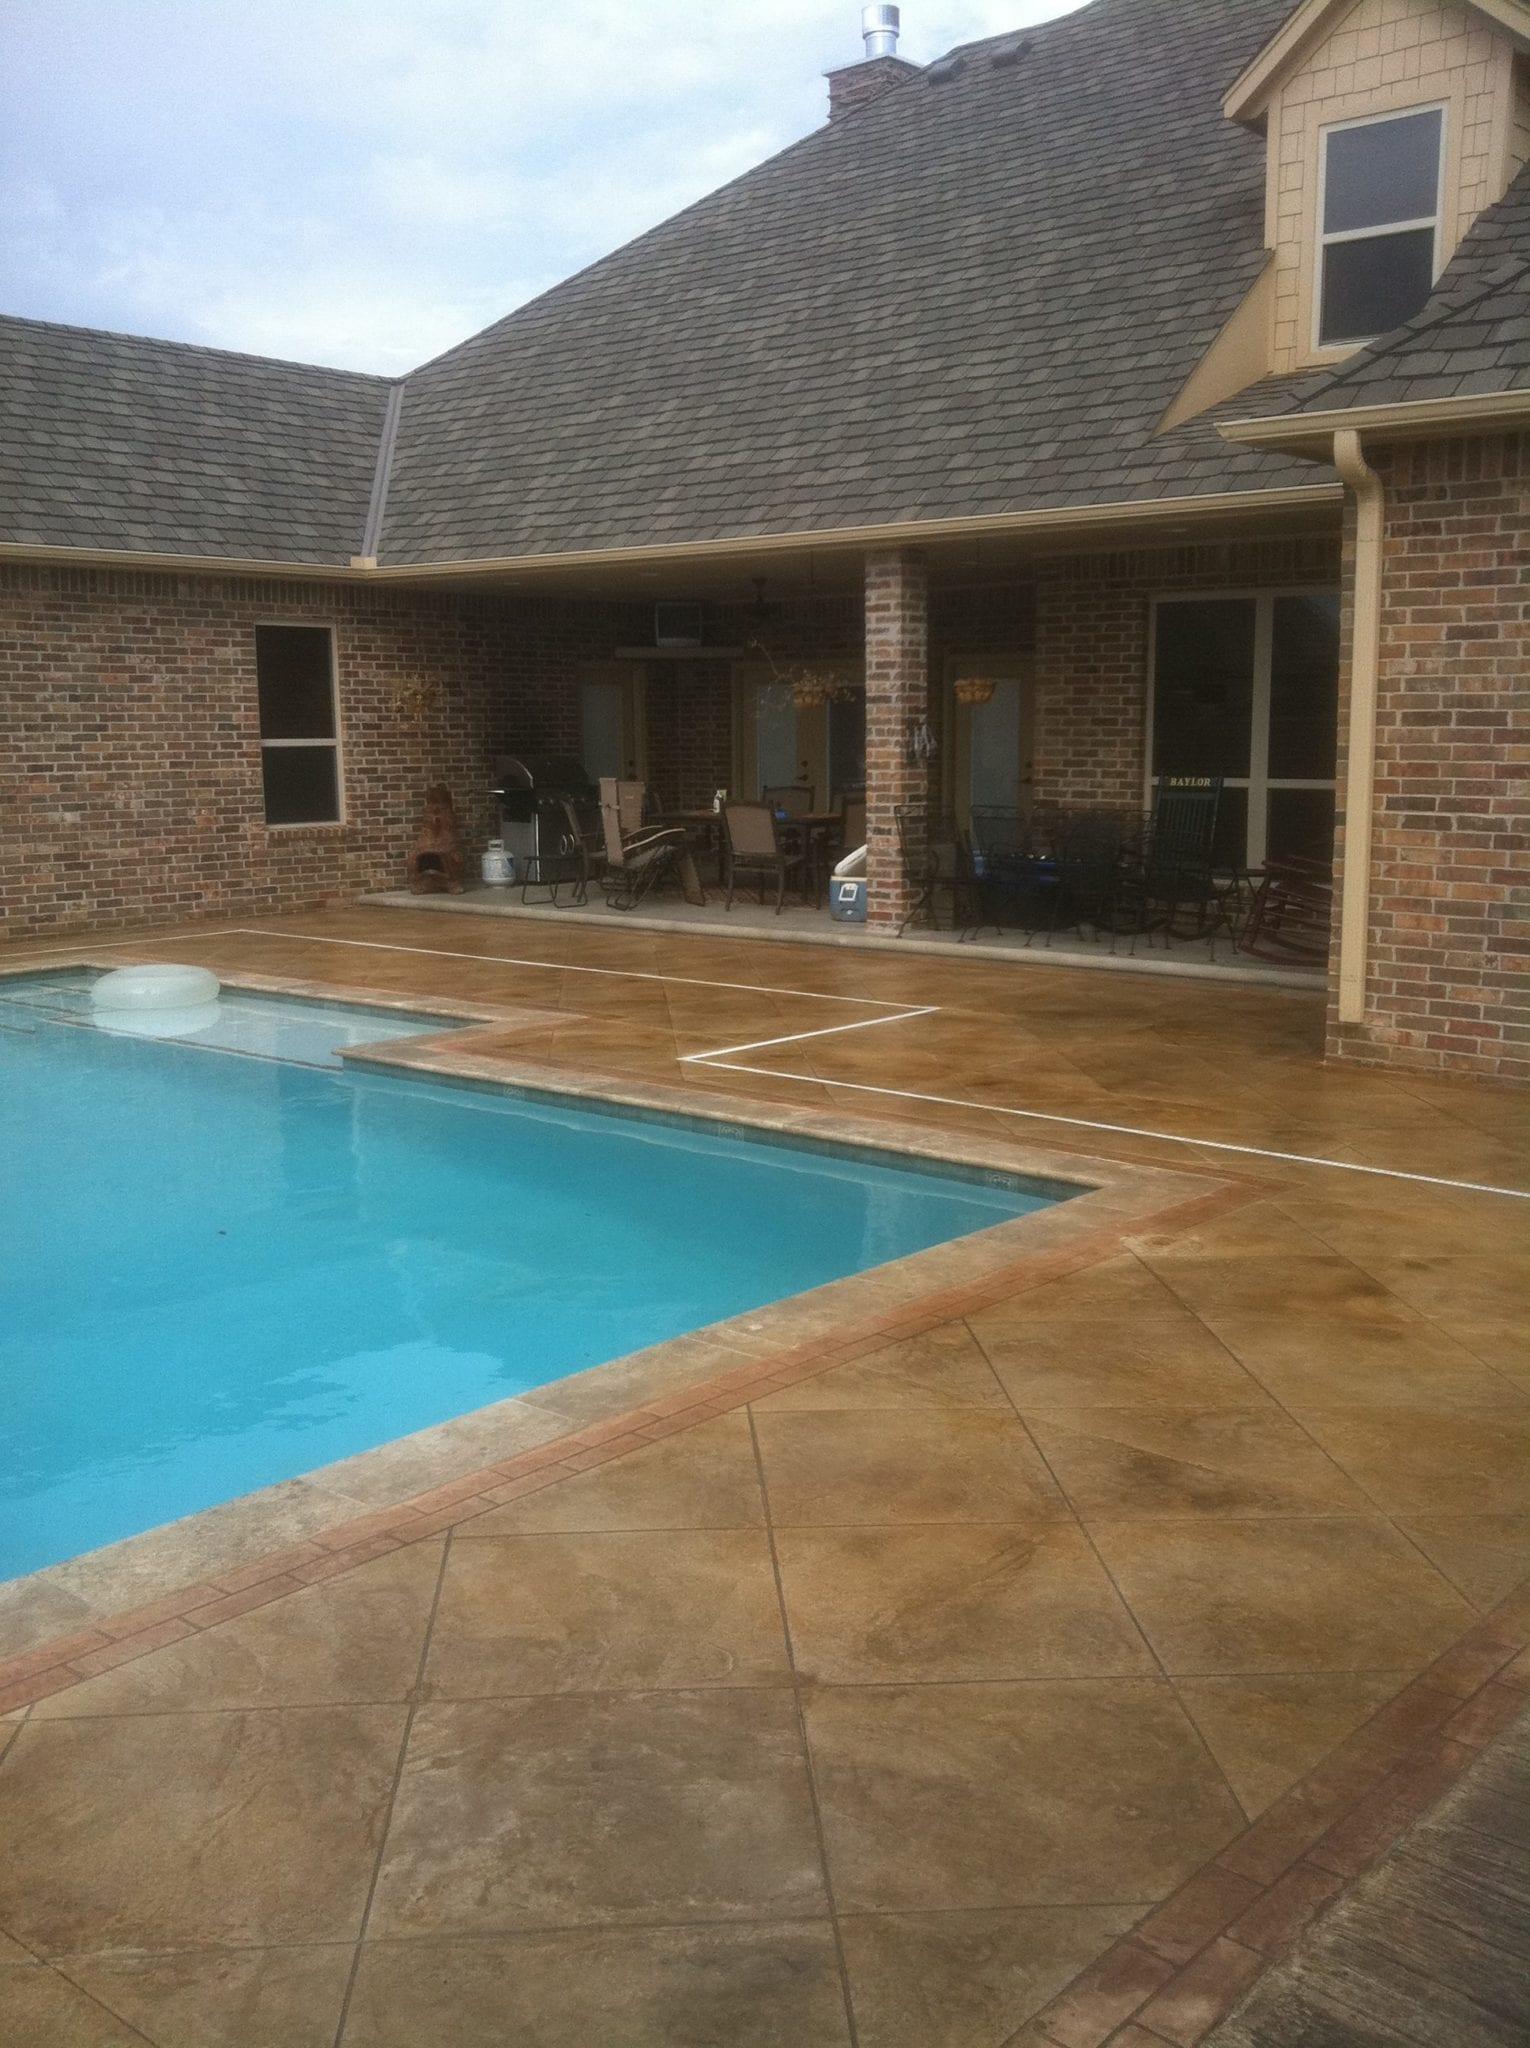 wet stone outside around pool